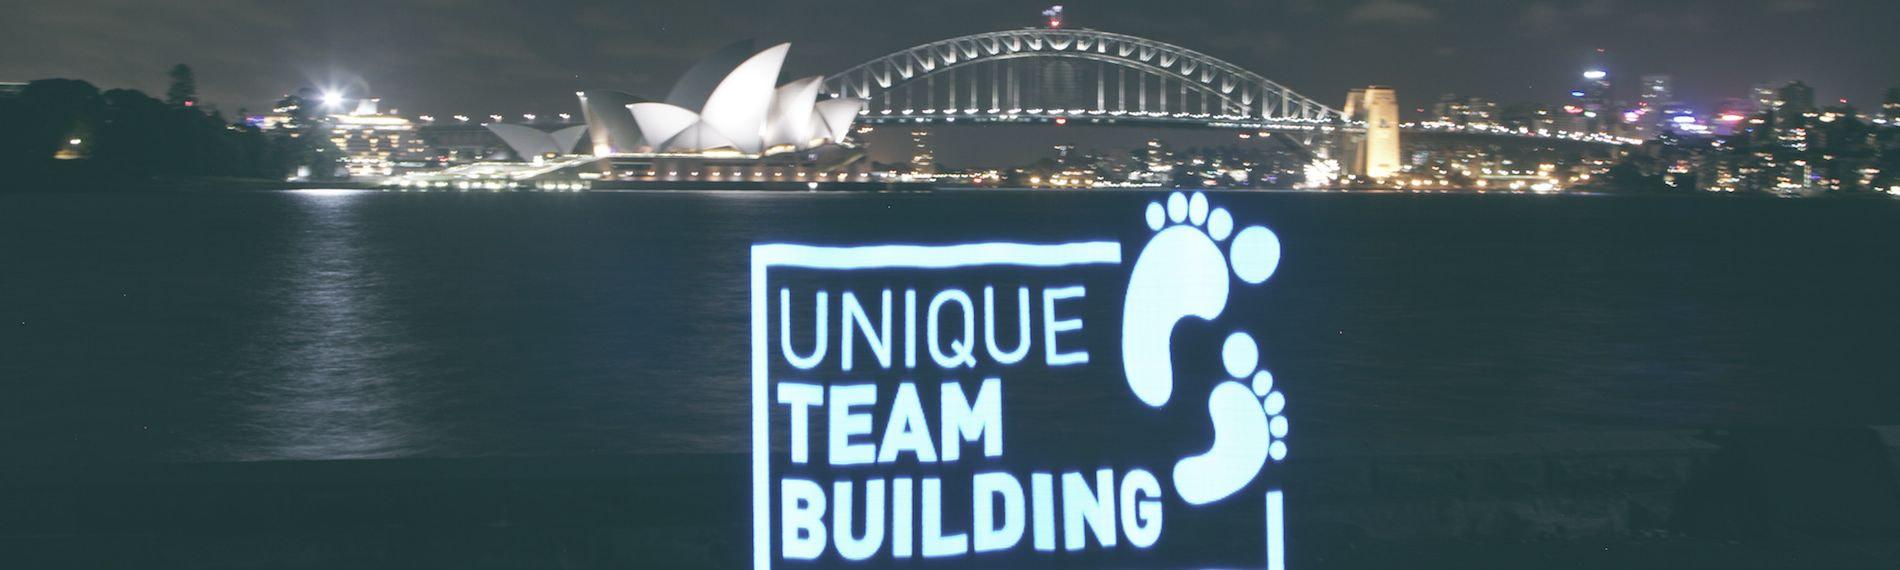 https://mlcb8szwyxfv.i.optimole.com/tTCGqh8-hoo68Ngz/w:auto/h:auto/q:90/https://www.uniqueteambuilding.com.au/wp-content/uploads/2015/01/team-building-default-rot-1.jpg